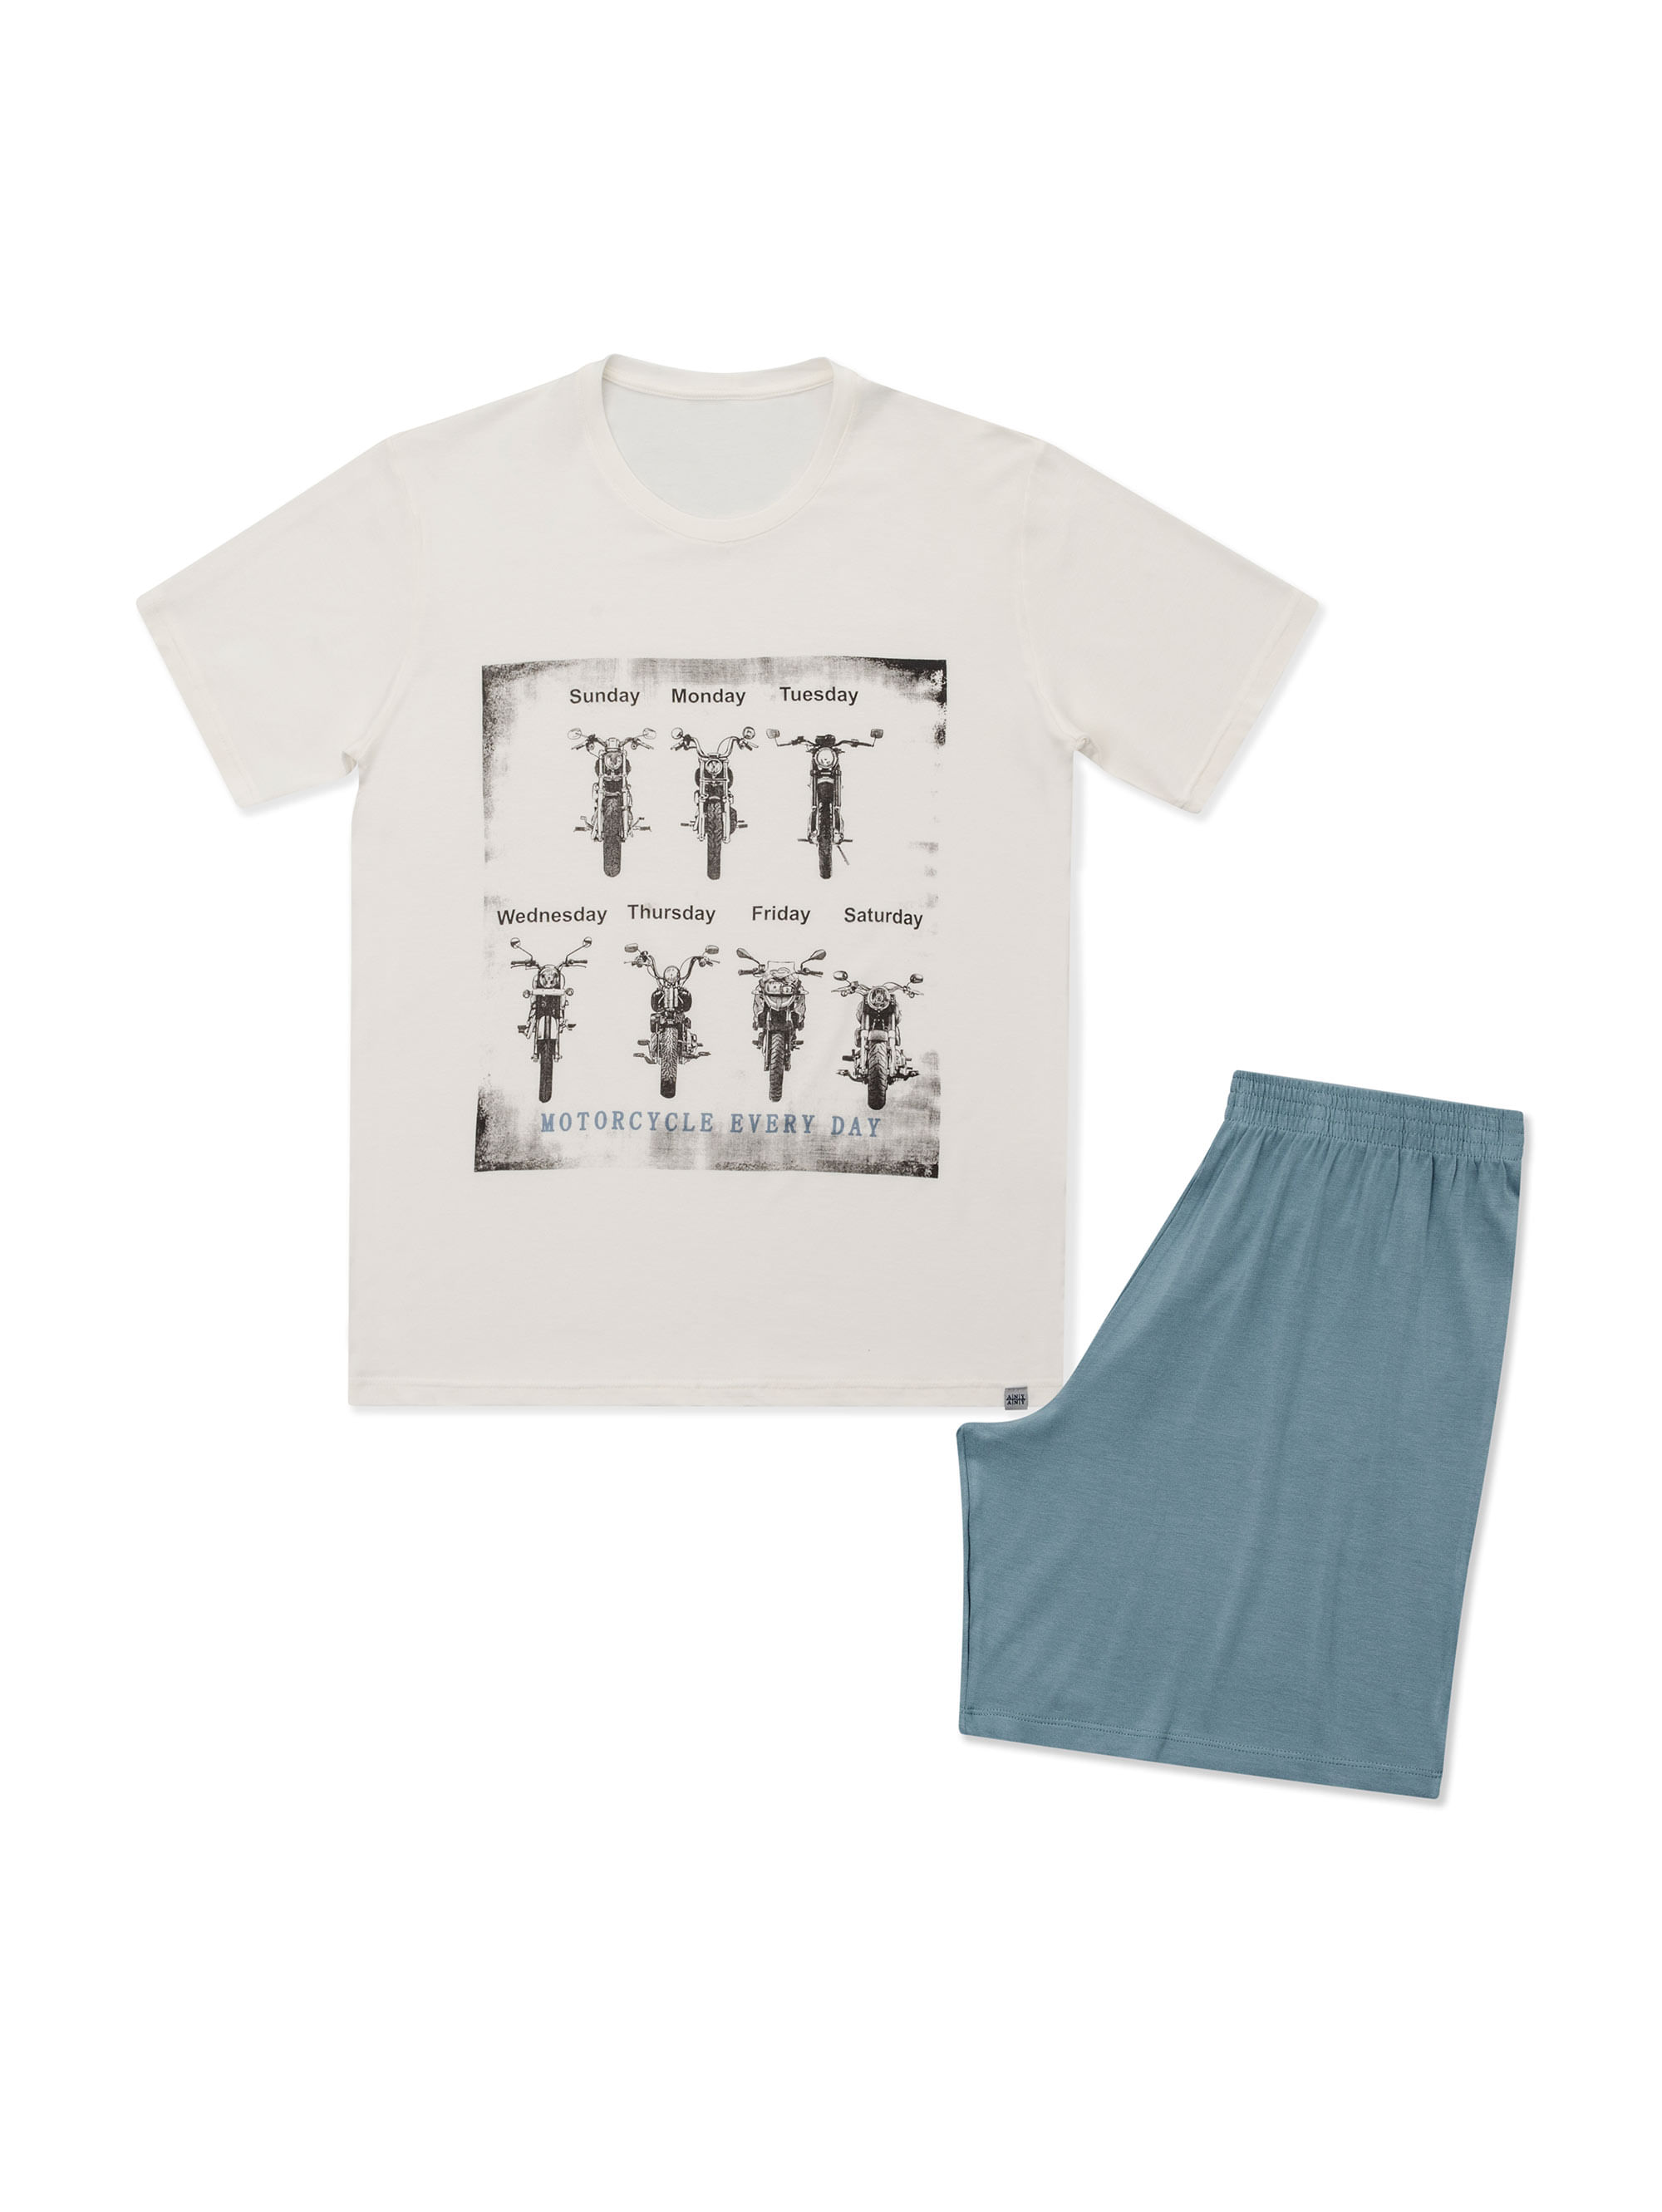 Pijama-Curto---Manga-Curta--M-MONZA-OUT---04.02.0778---verso